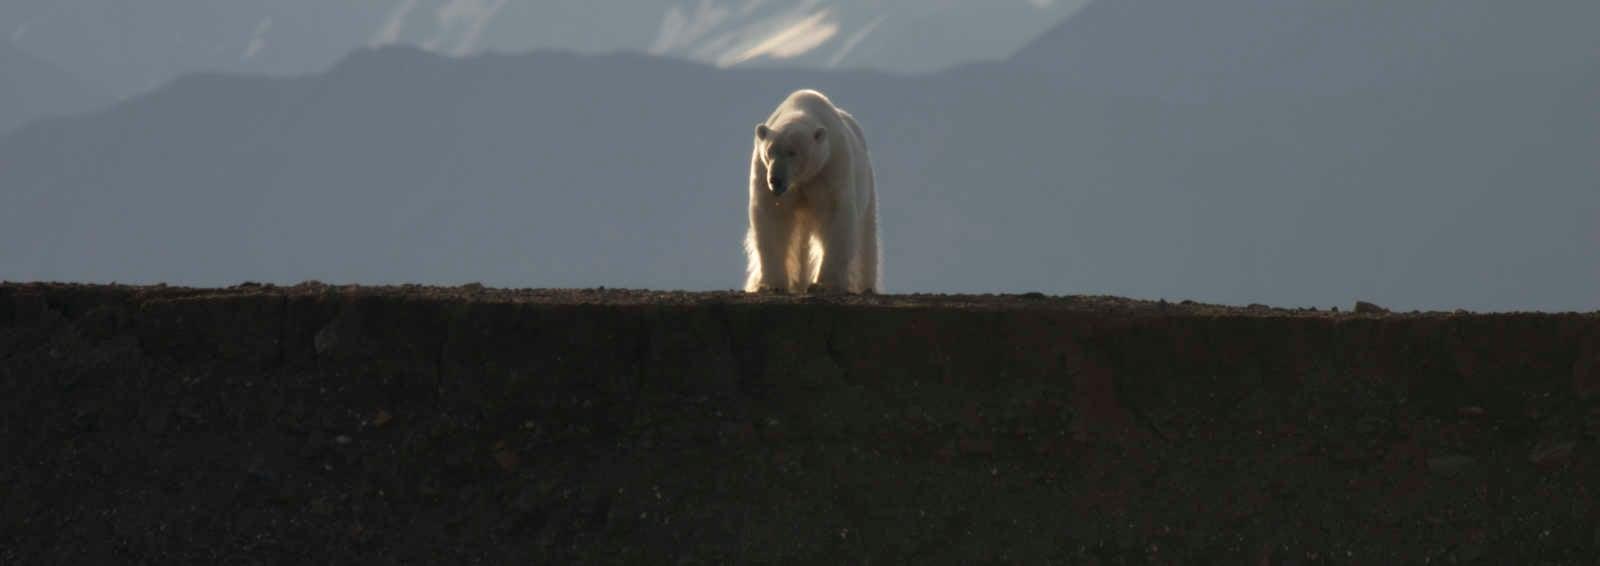 Polar bear, Spitsbergen (Svalbard), Norway